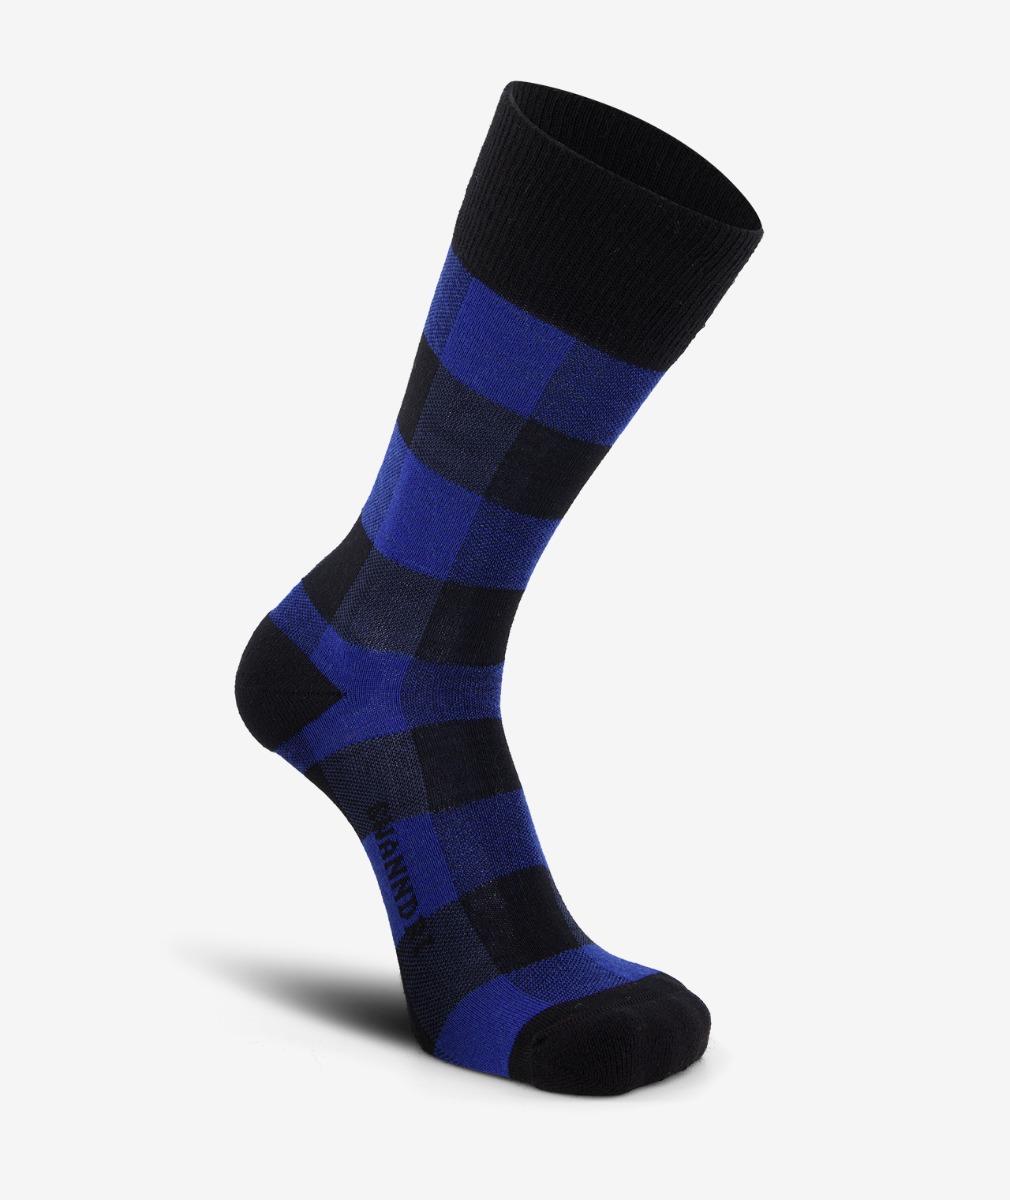 Swanndri Colombo Check Merino Sock in Blue/Black Check